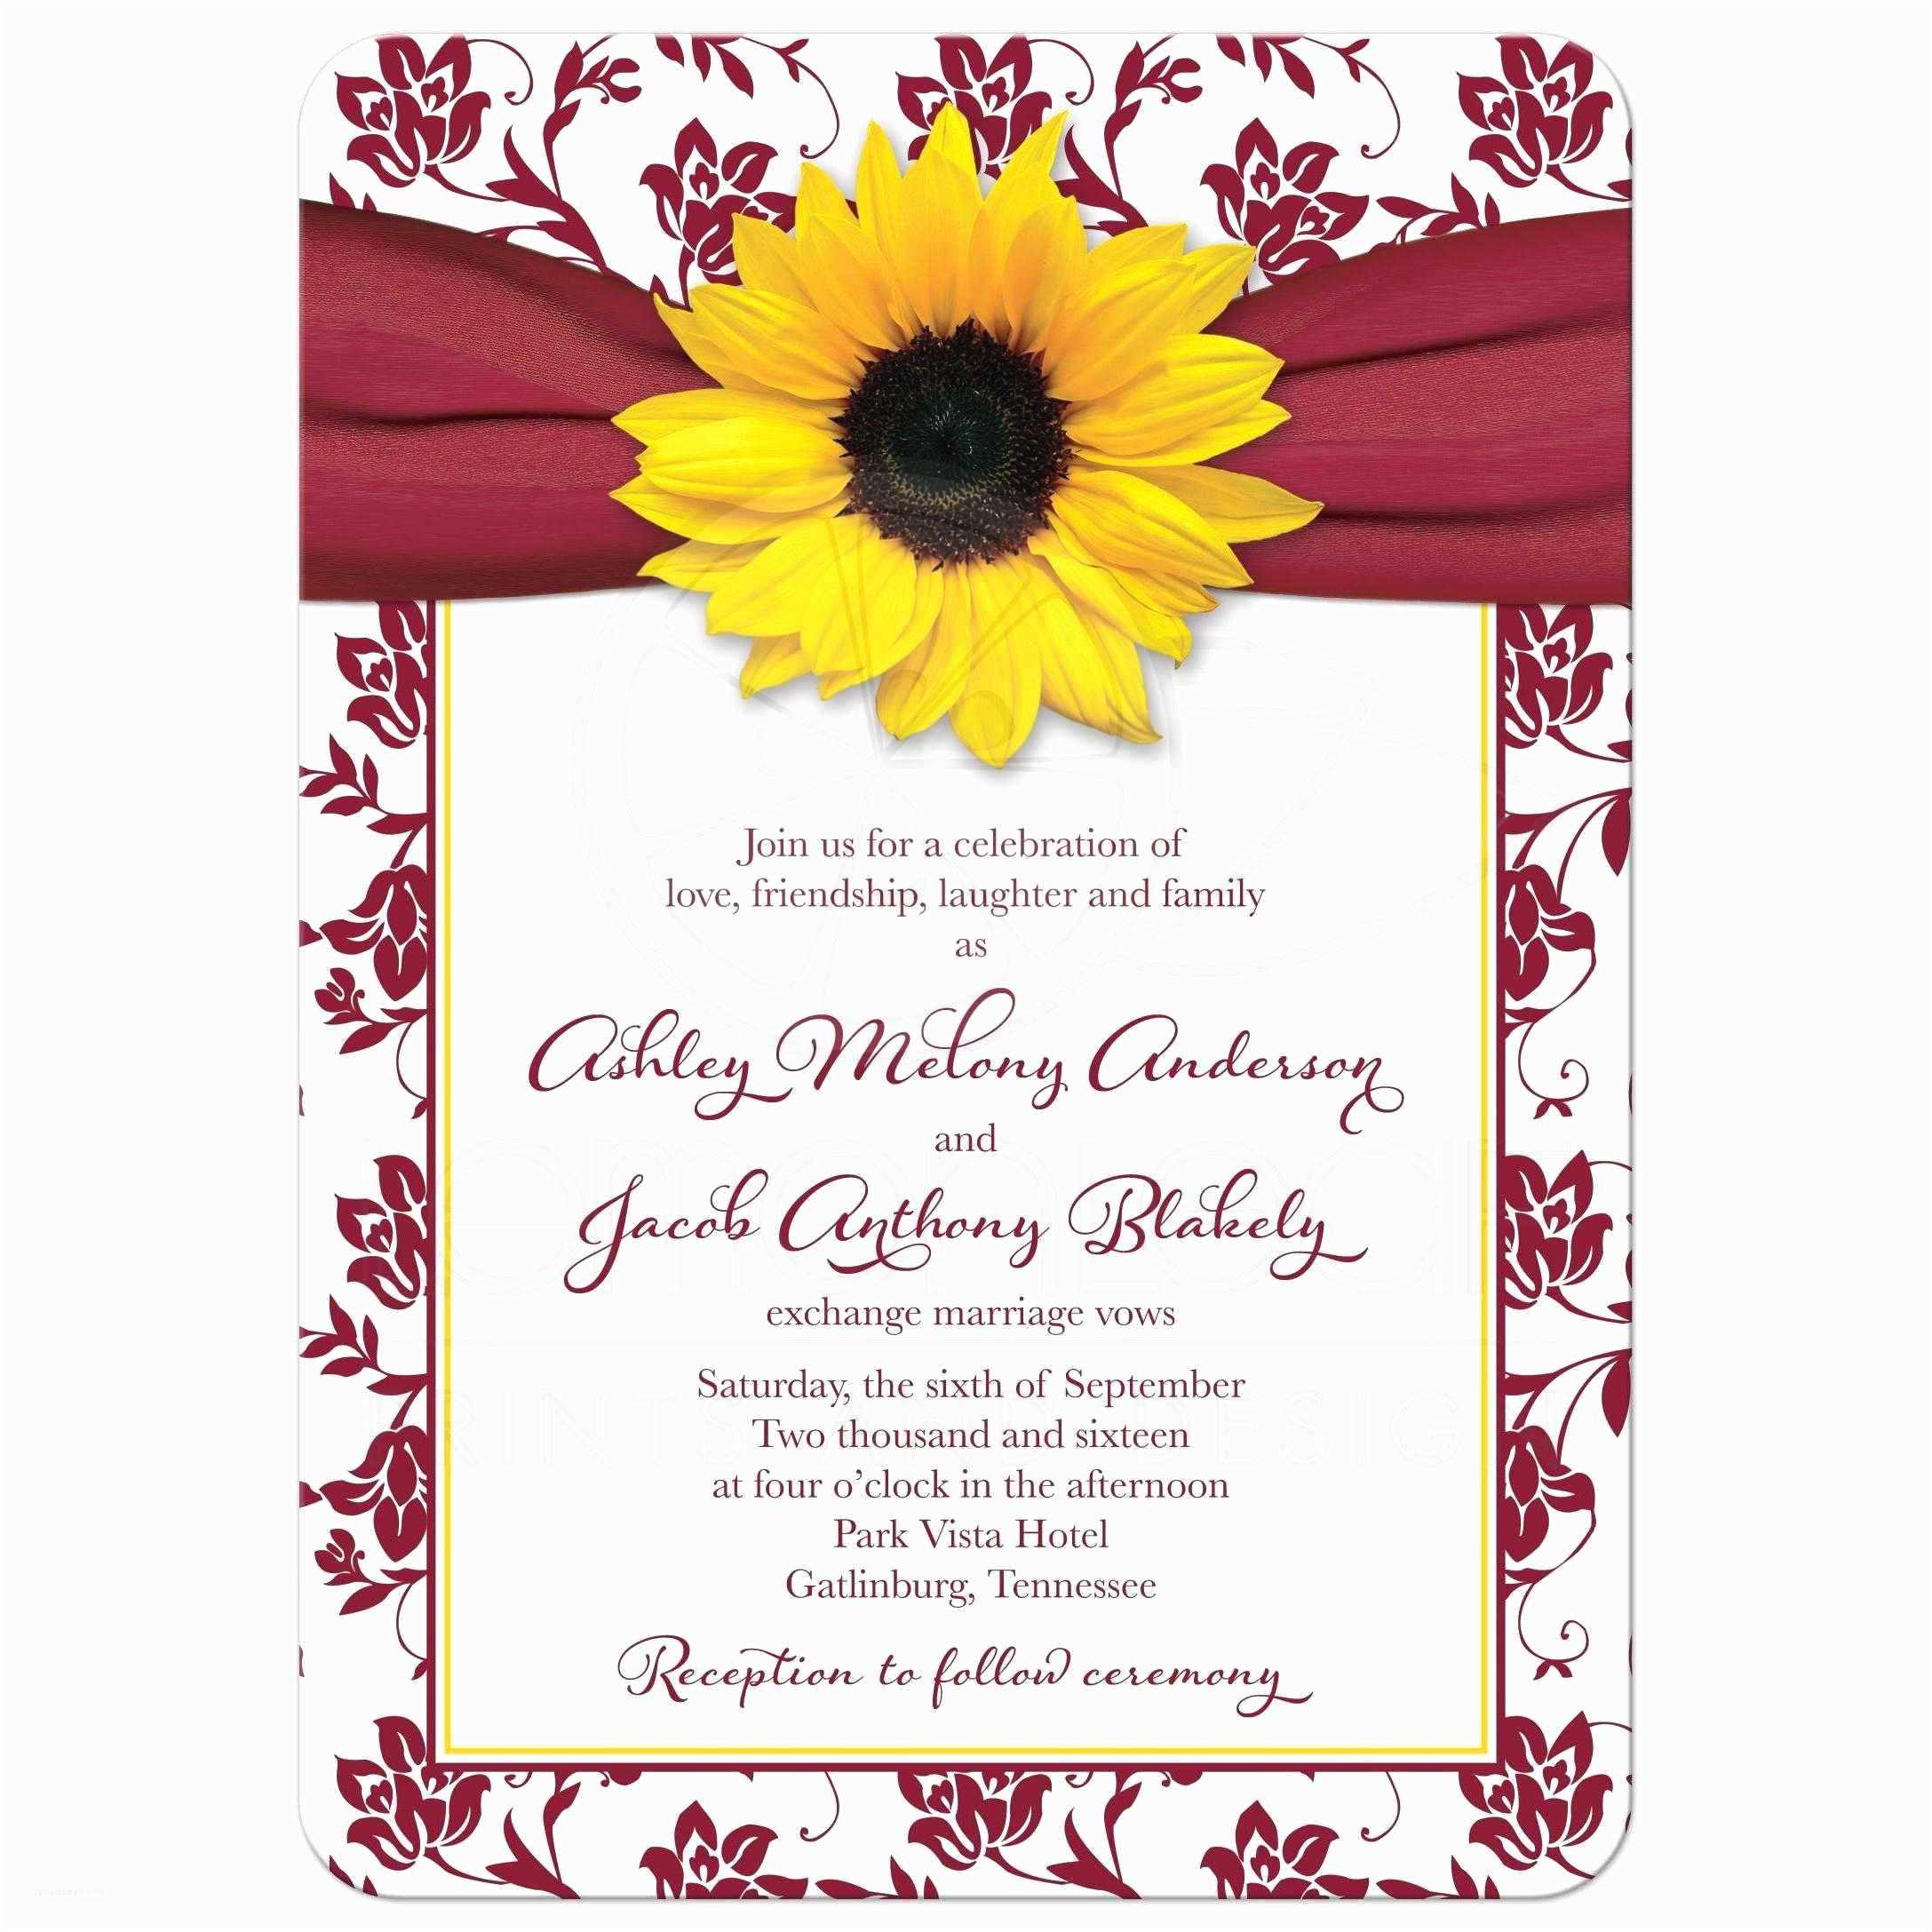 Burgundy and White Wedding Invitations Fall Sunflower Wedding Invitation Burgundy Yellow